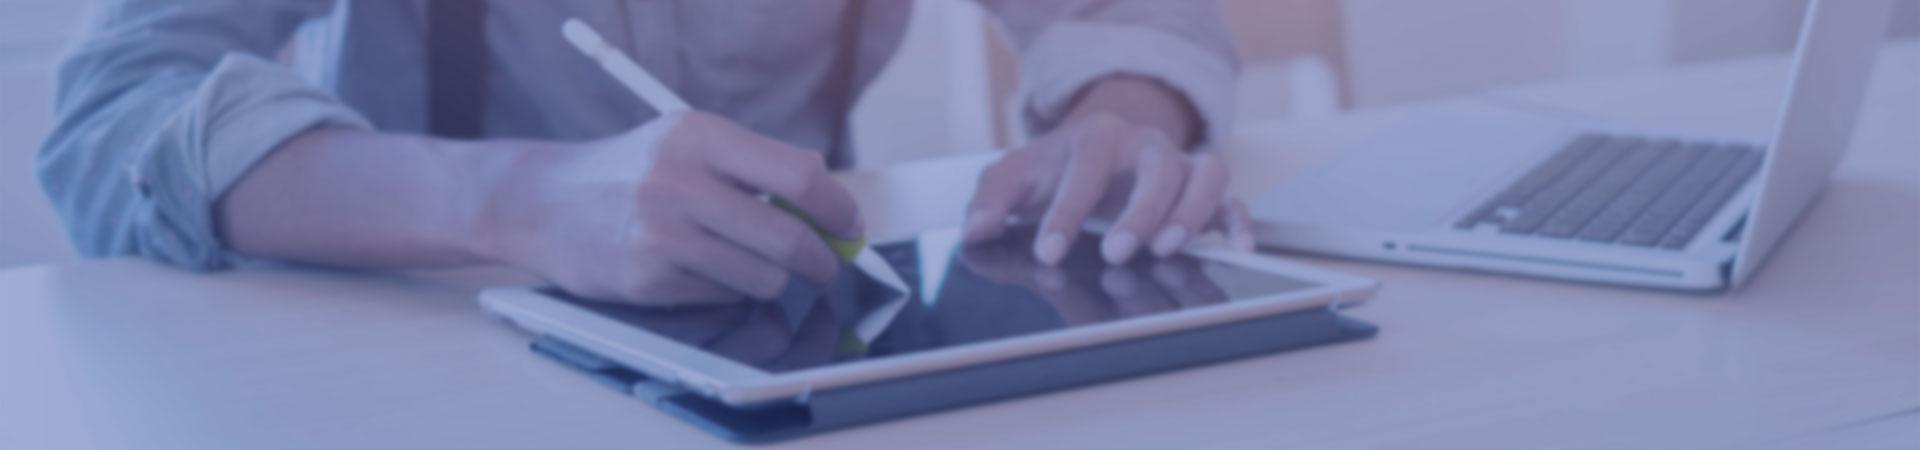 Elektronischer-Maklervertrag-_-